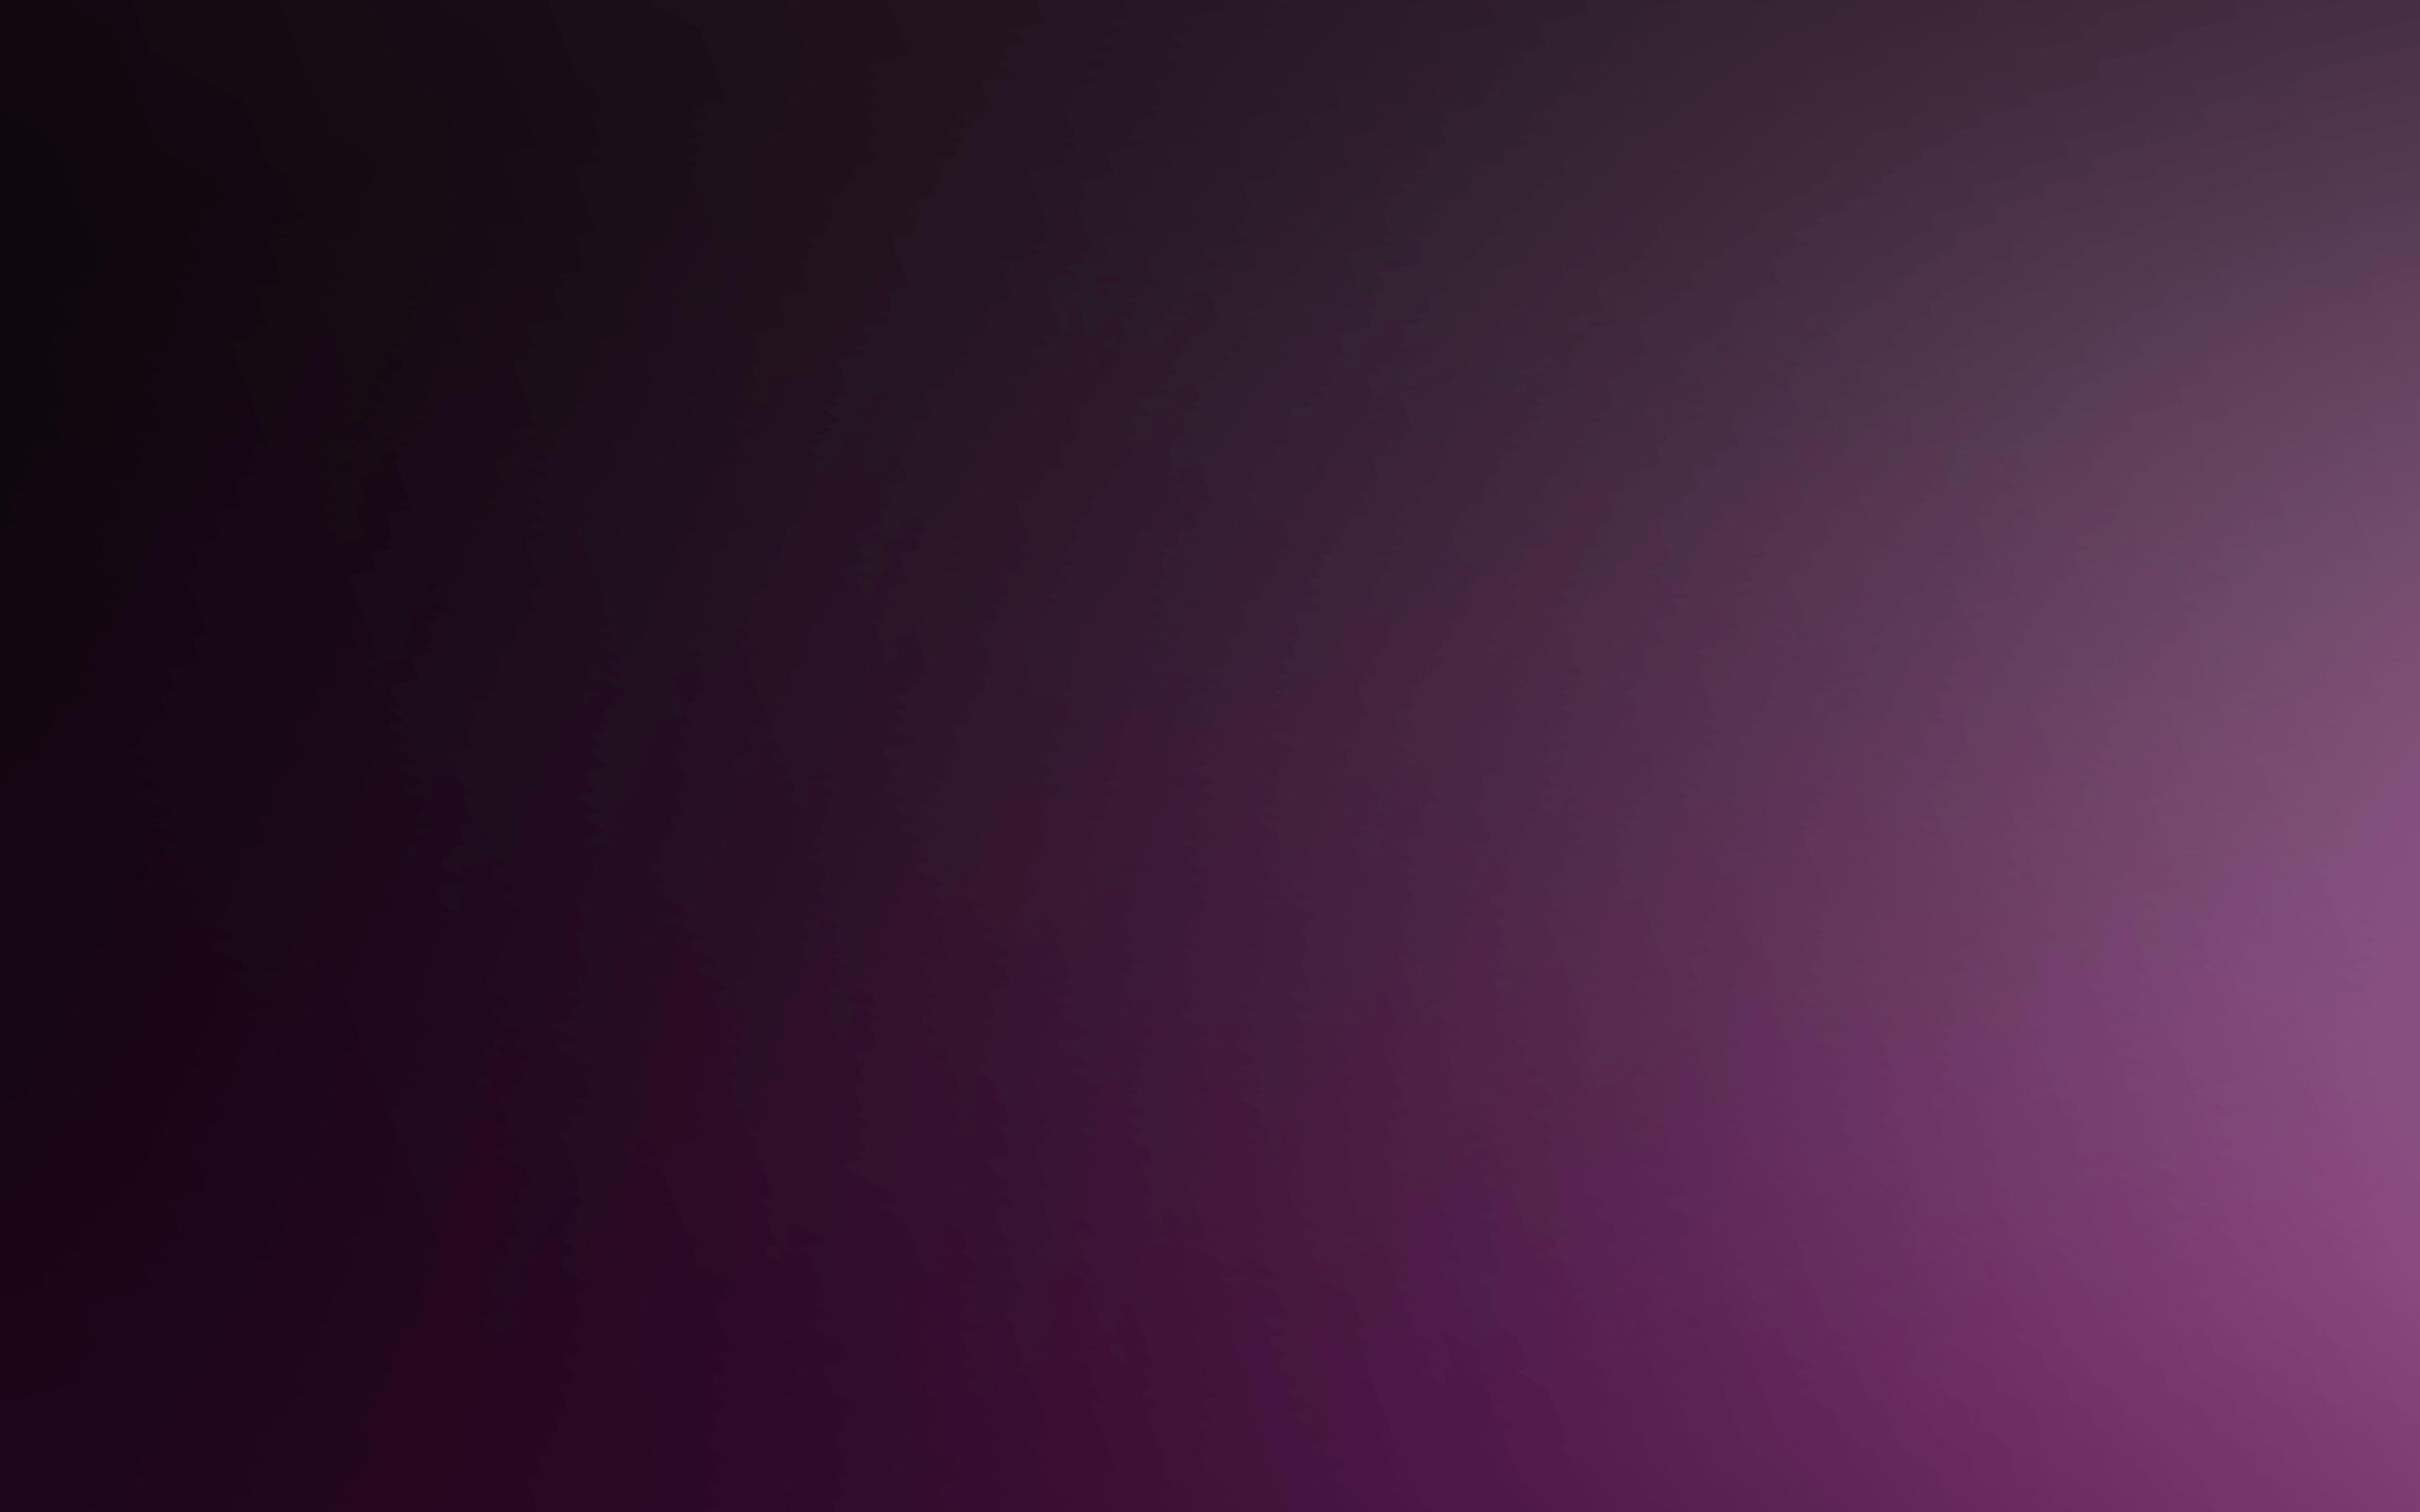 Dark Purple Wallpapers 2560x1600